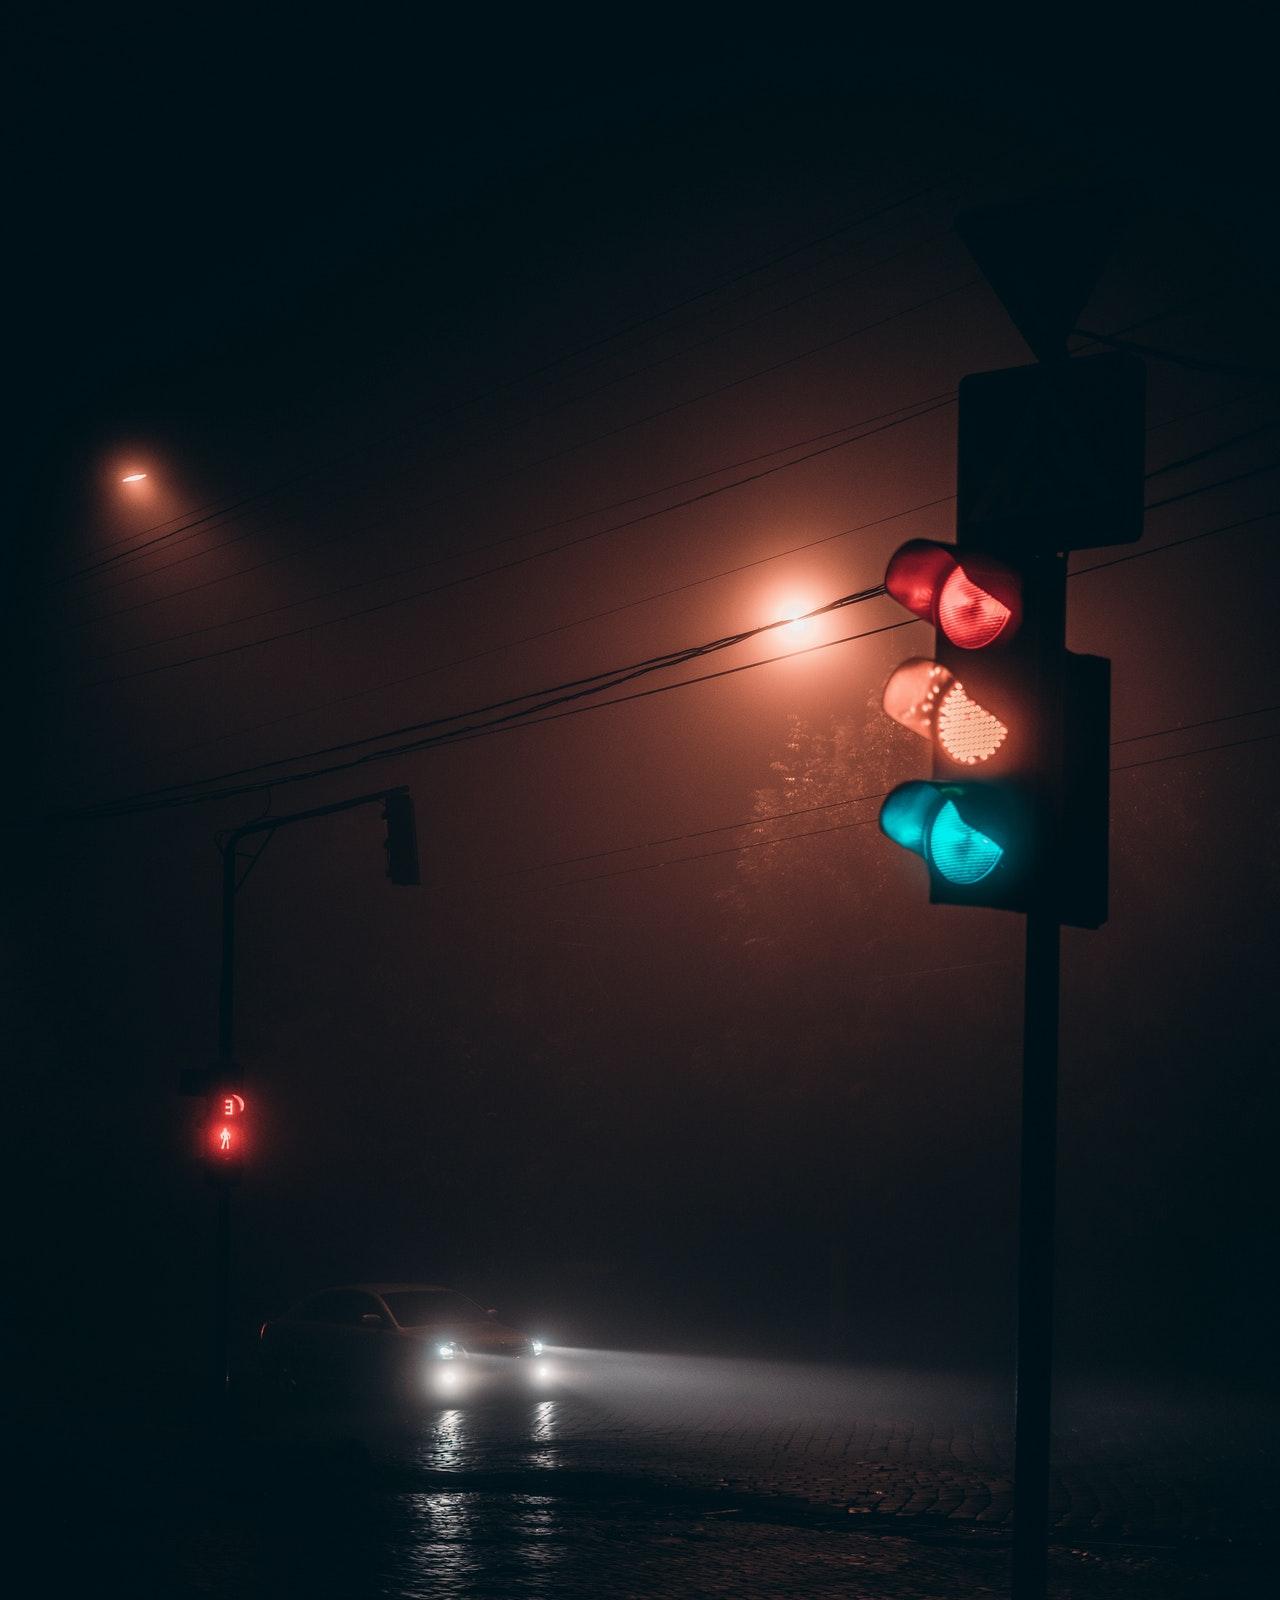 señales de transito semaforo